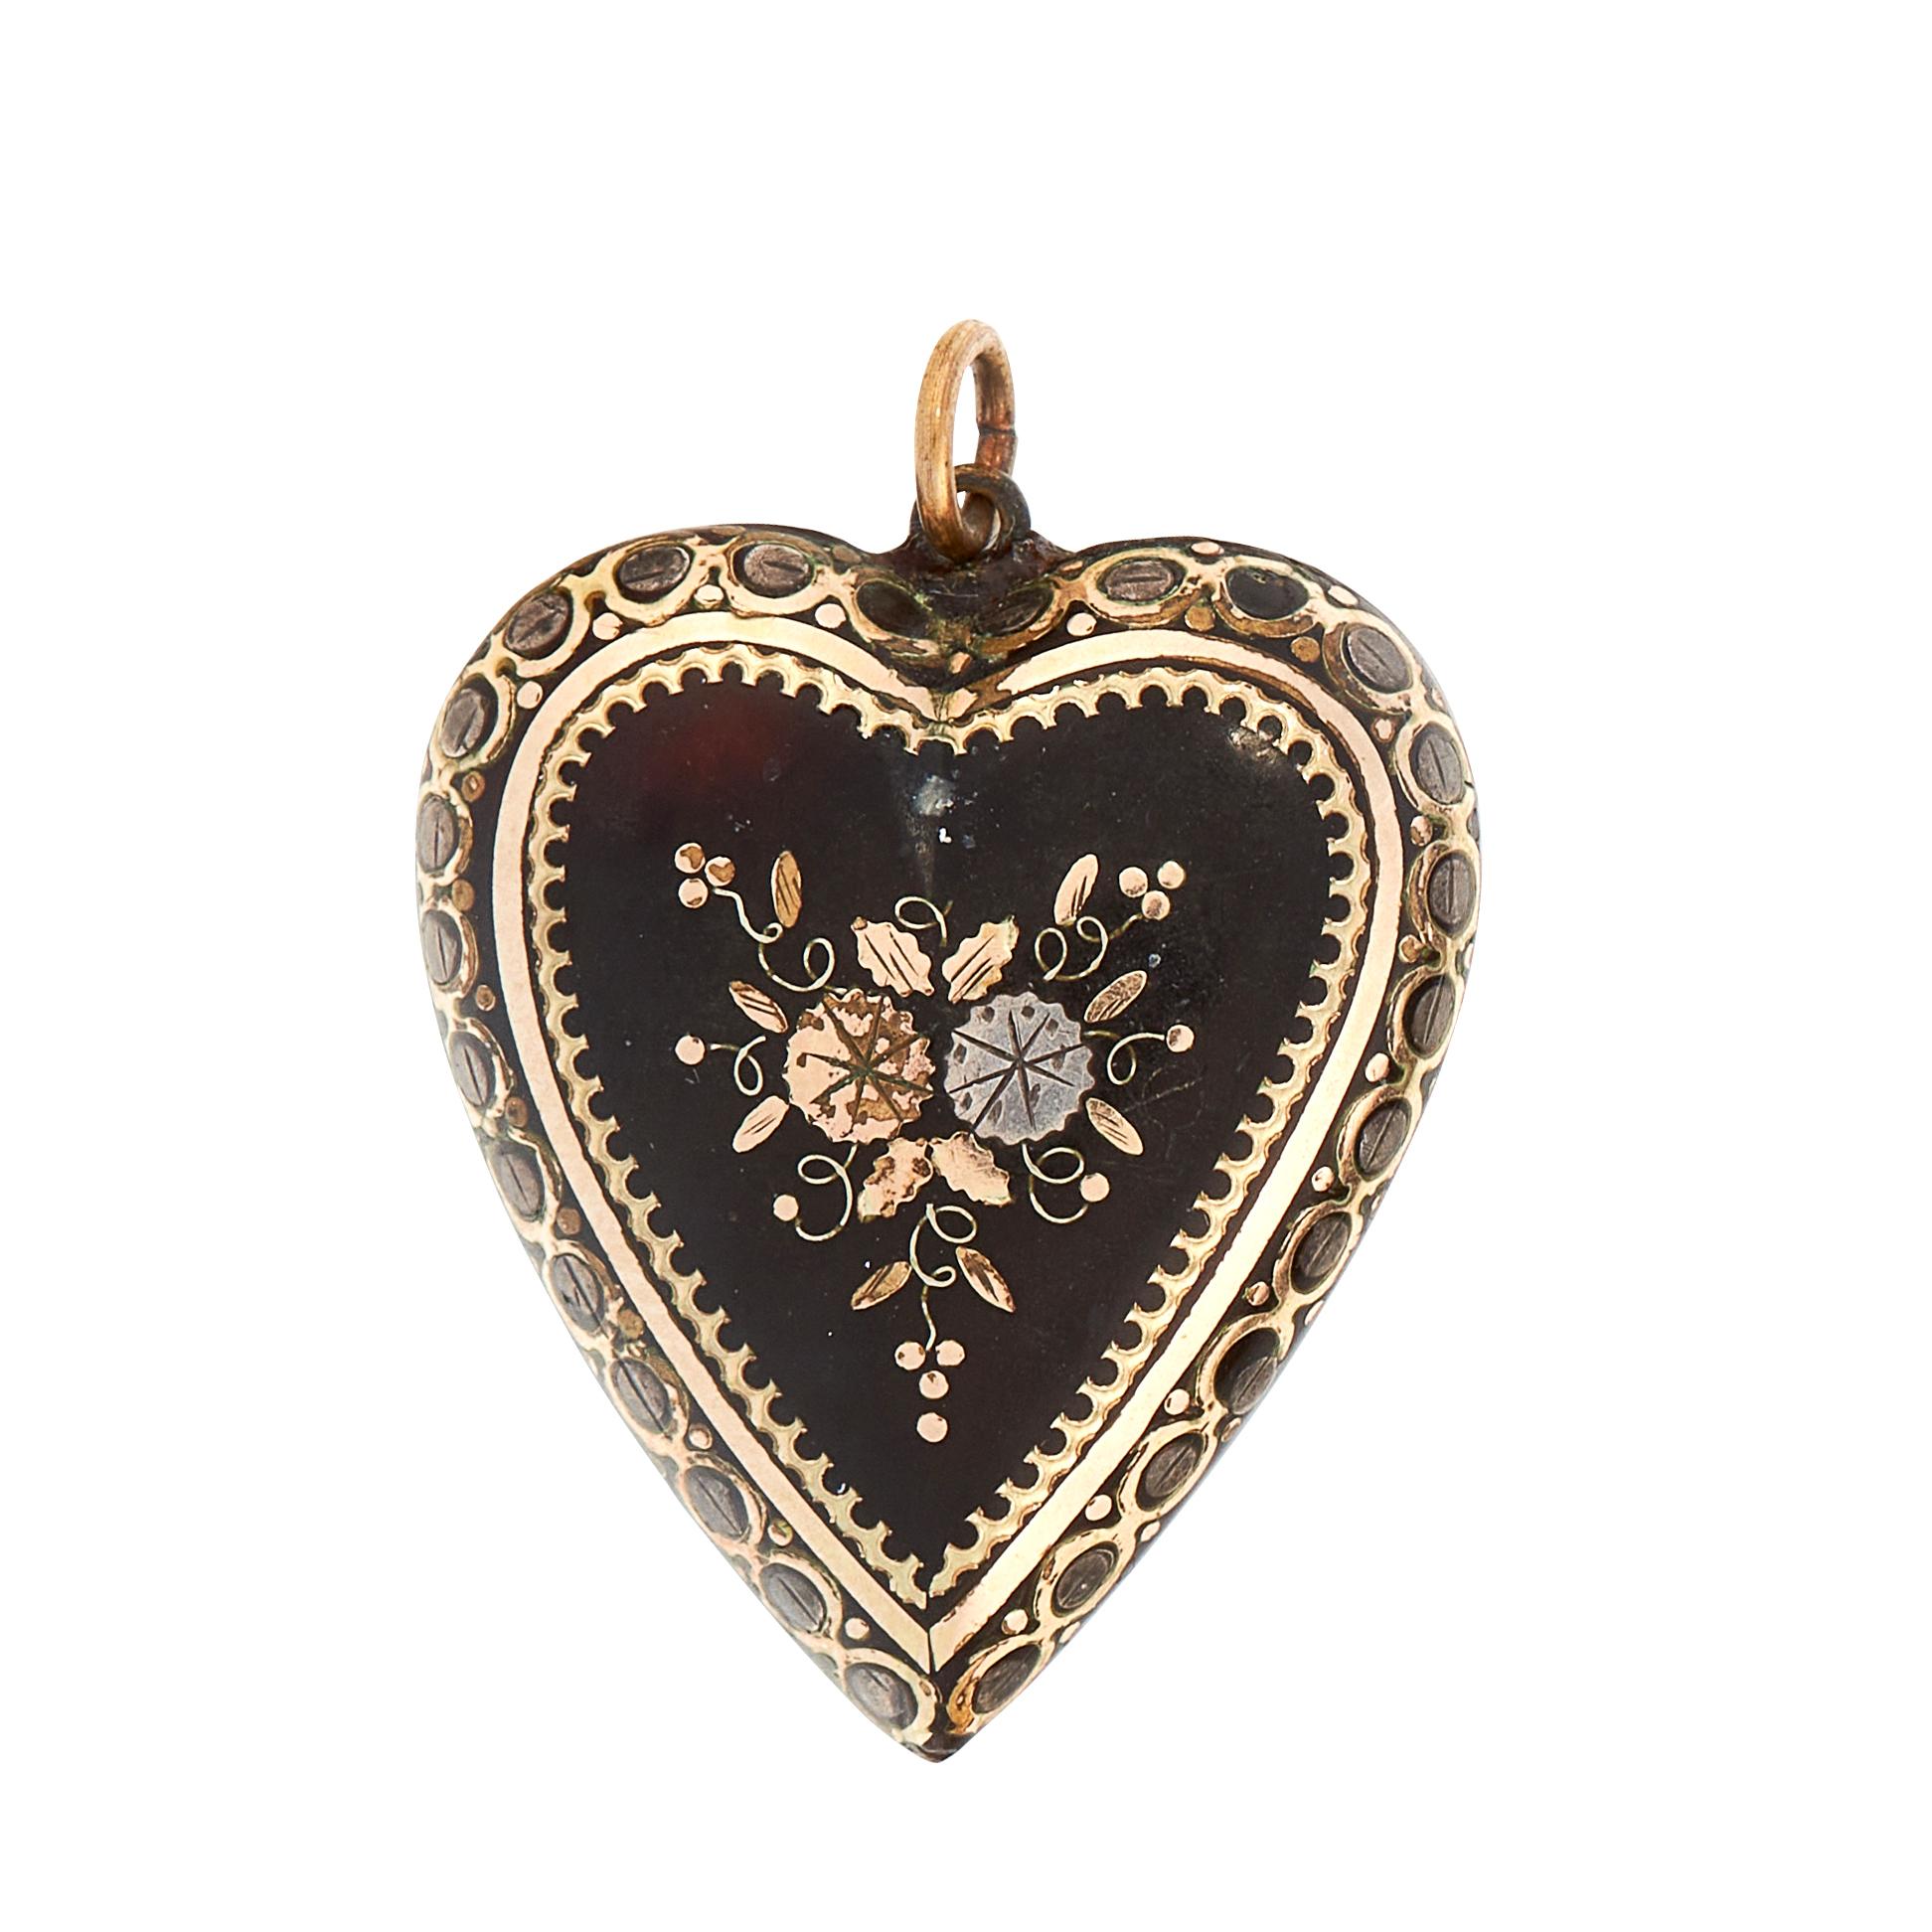 AN ANTIQUE PIQUE TORTOISESHELL PENDANT in heart shaped design, set with floral pique design,